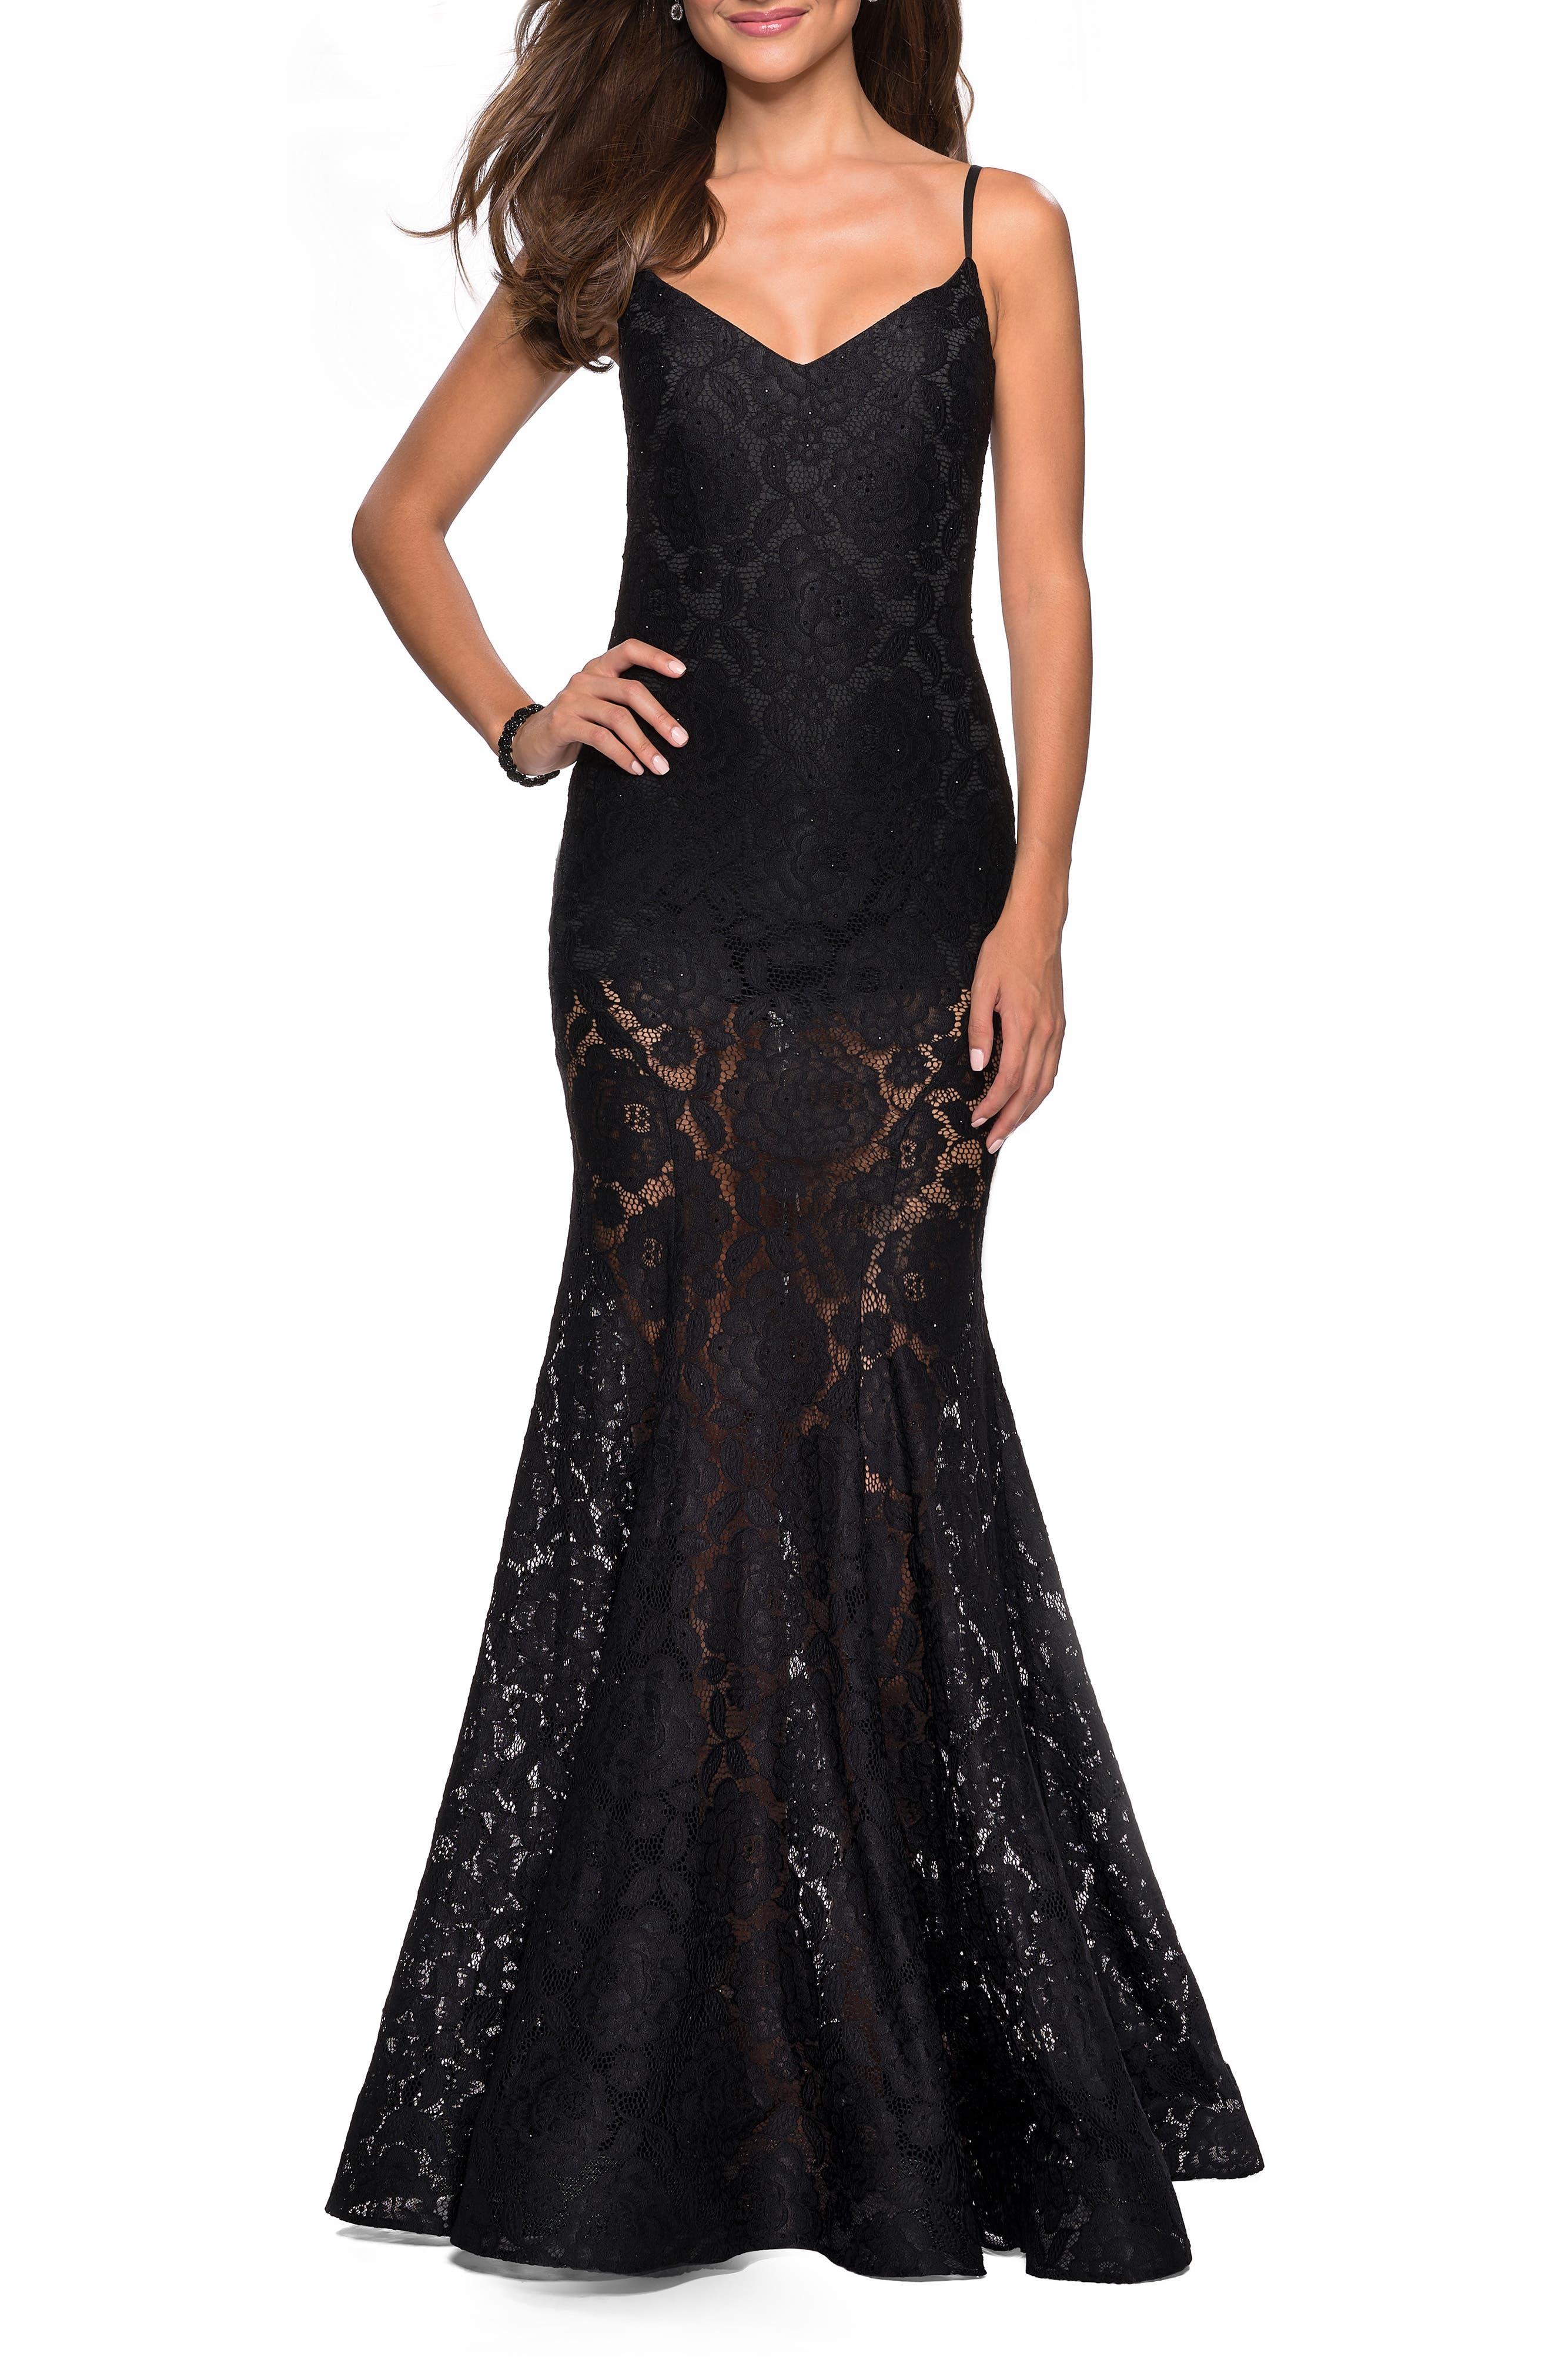 La Femme Stretch Lace Mermaid Evening Dress, Black